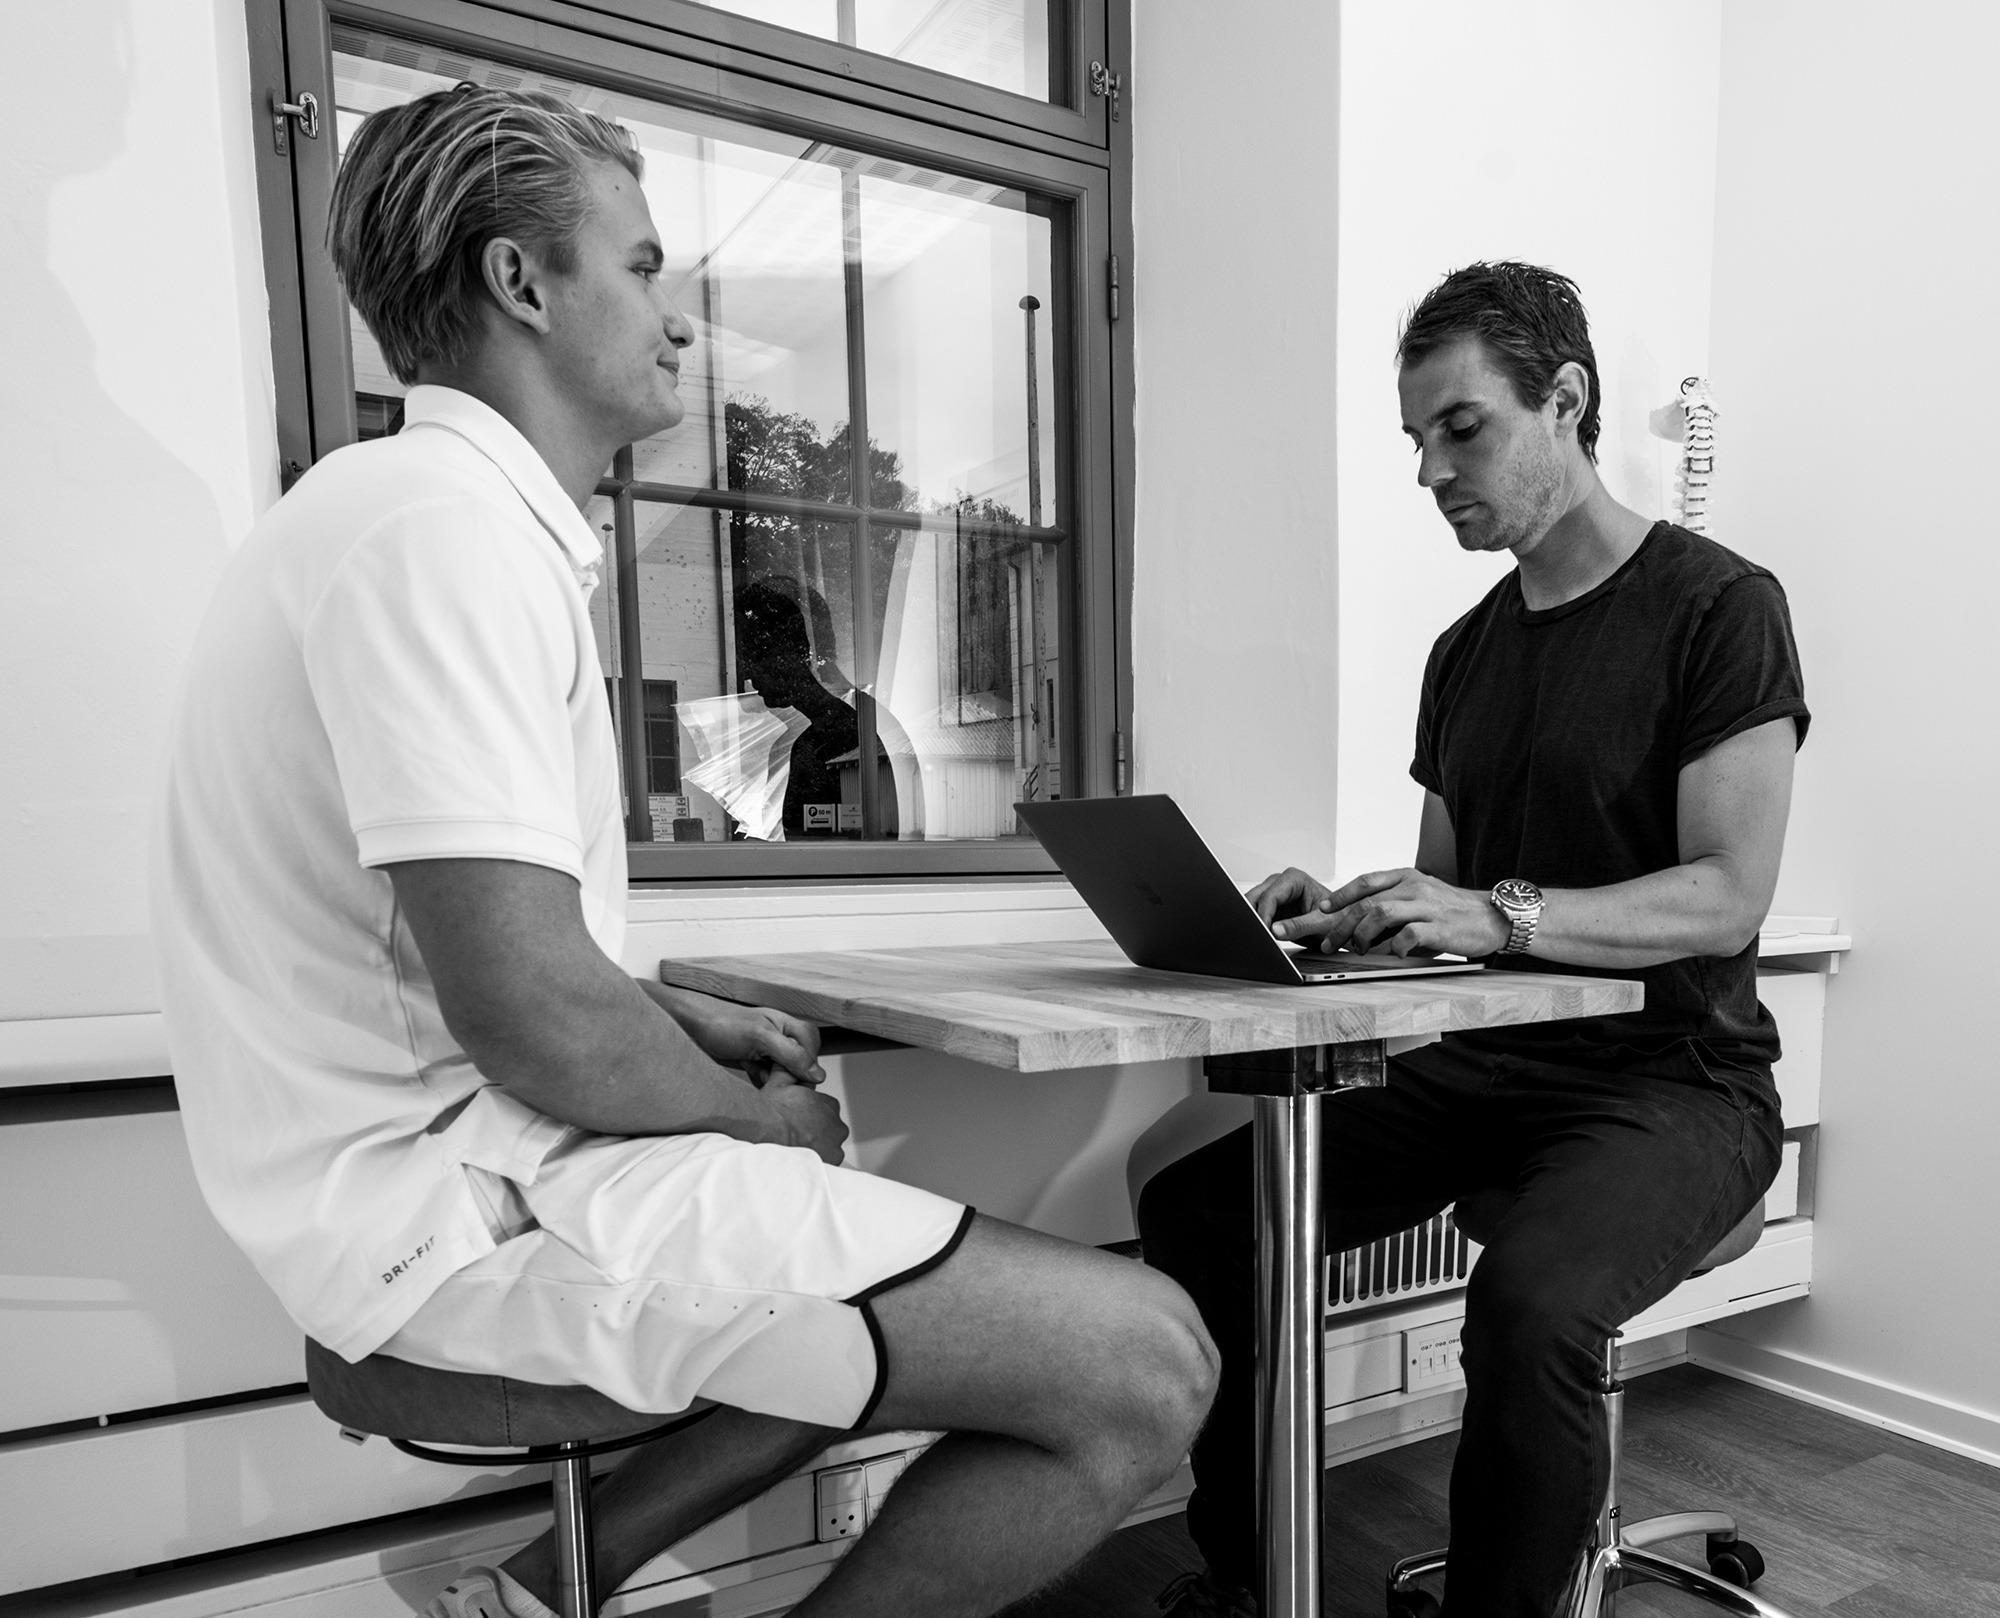 Snak om skinnebensbetændelse med fysioterapeut hos Sportsfysioterapien